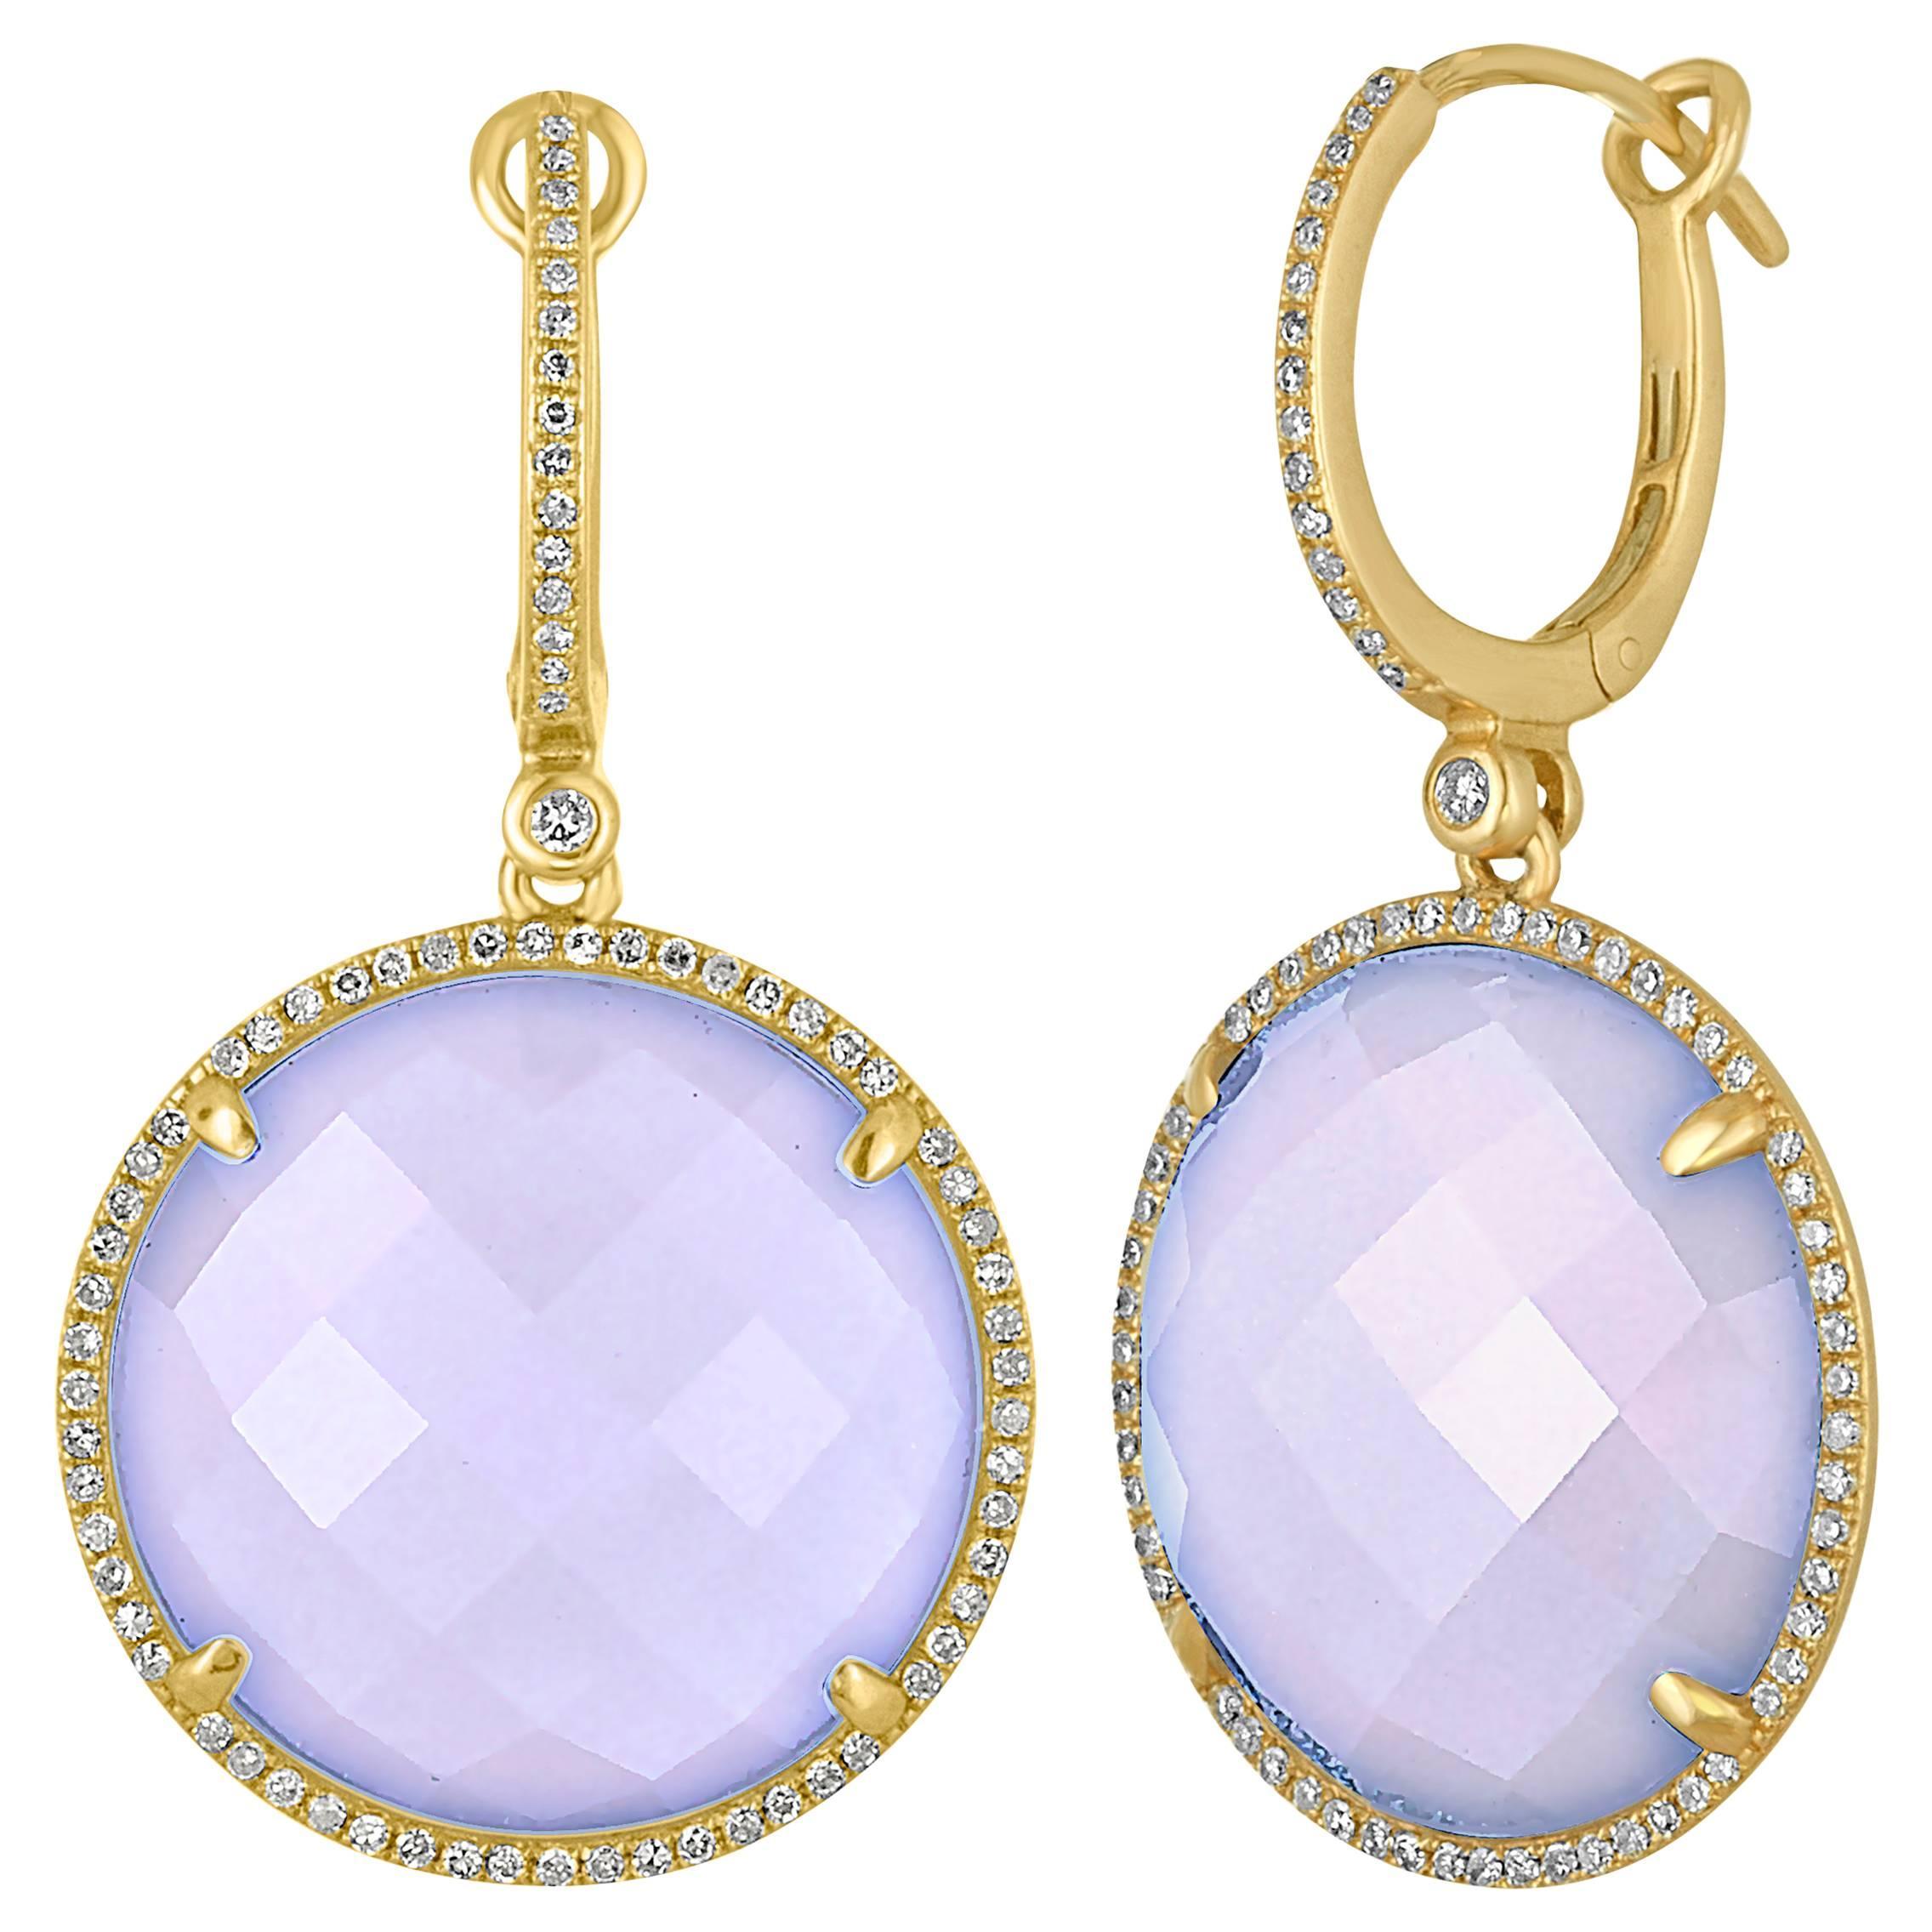 25.85 Carats Chalcedony Diamond Gold Drop Earrings